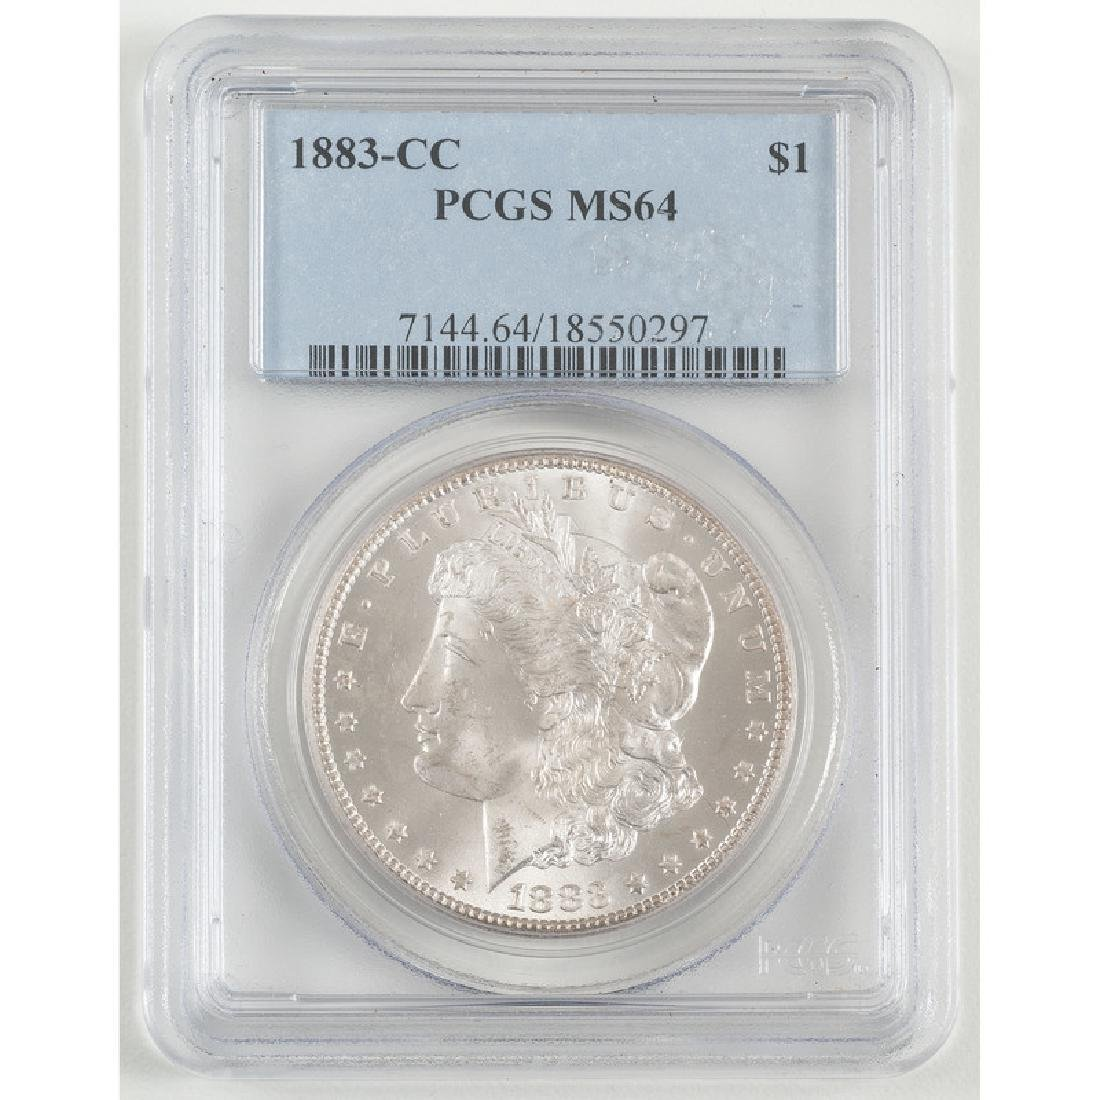 United States Morgan Silver Dollar 1883-CC, PCGS MS64